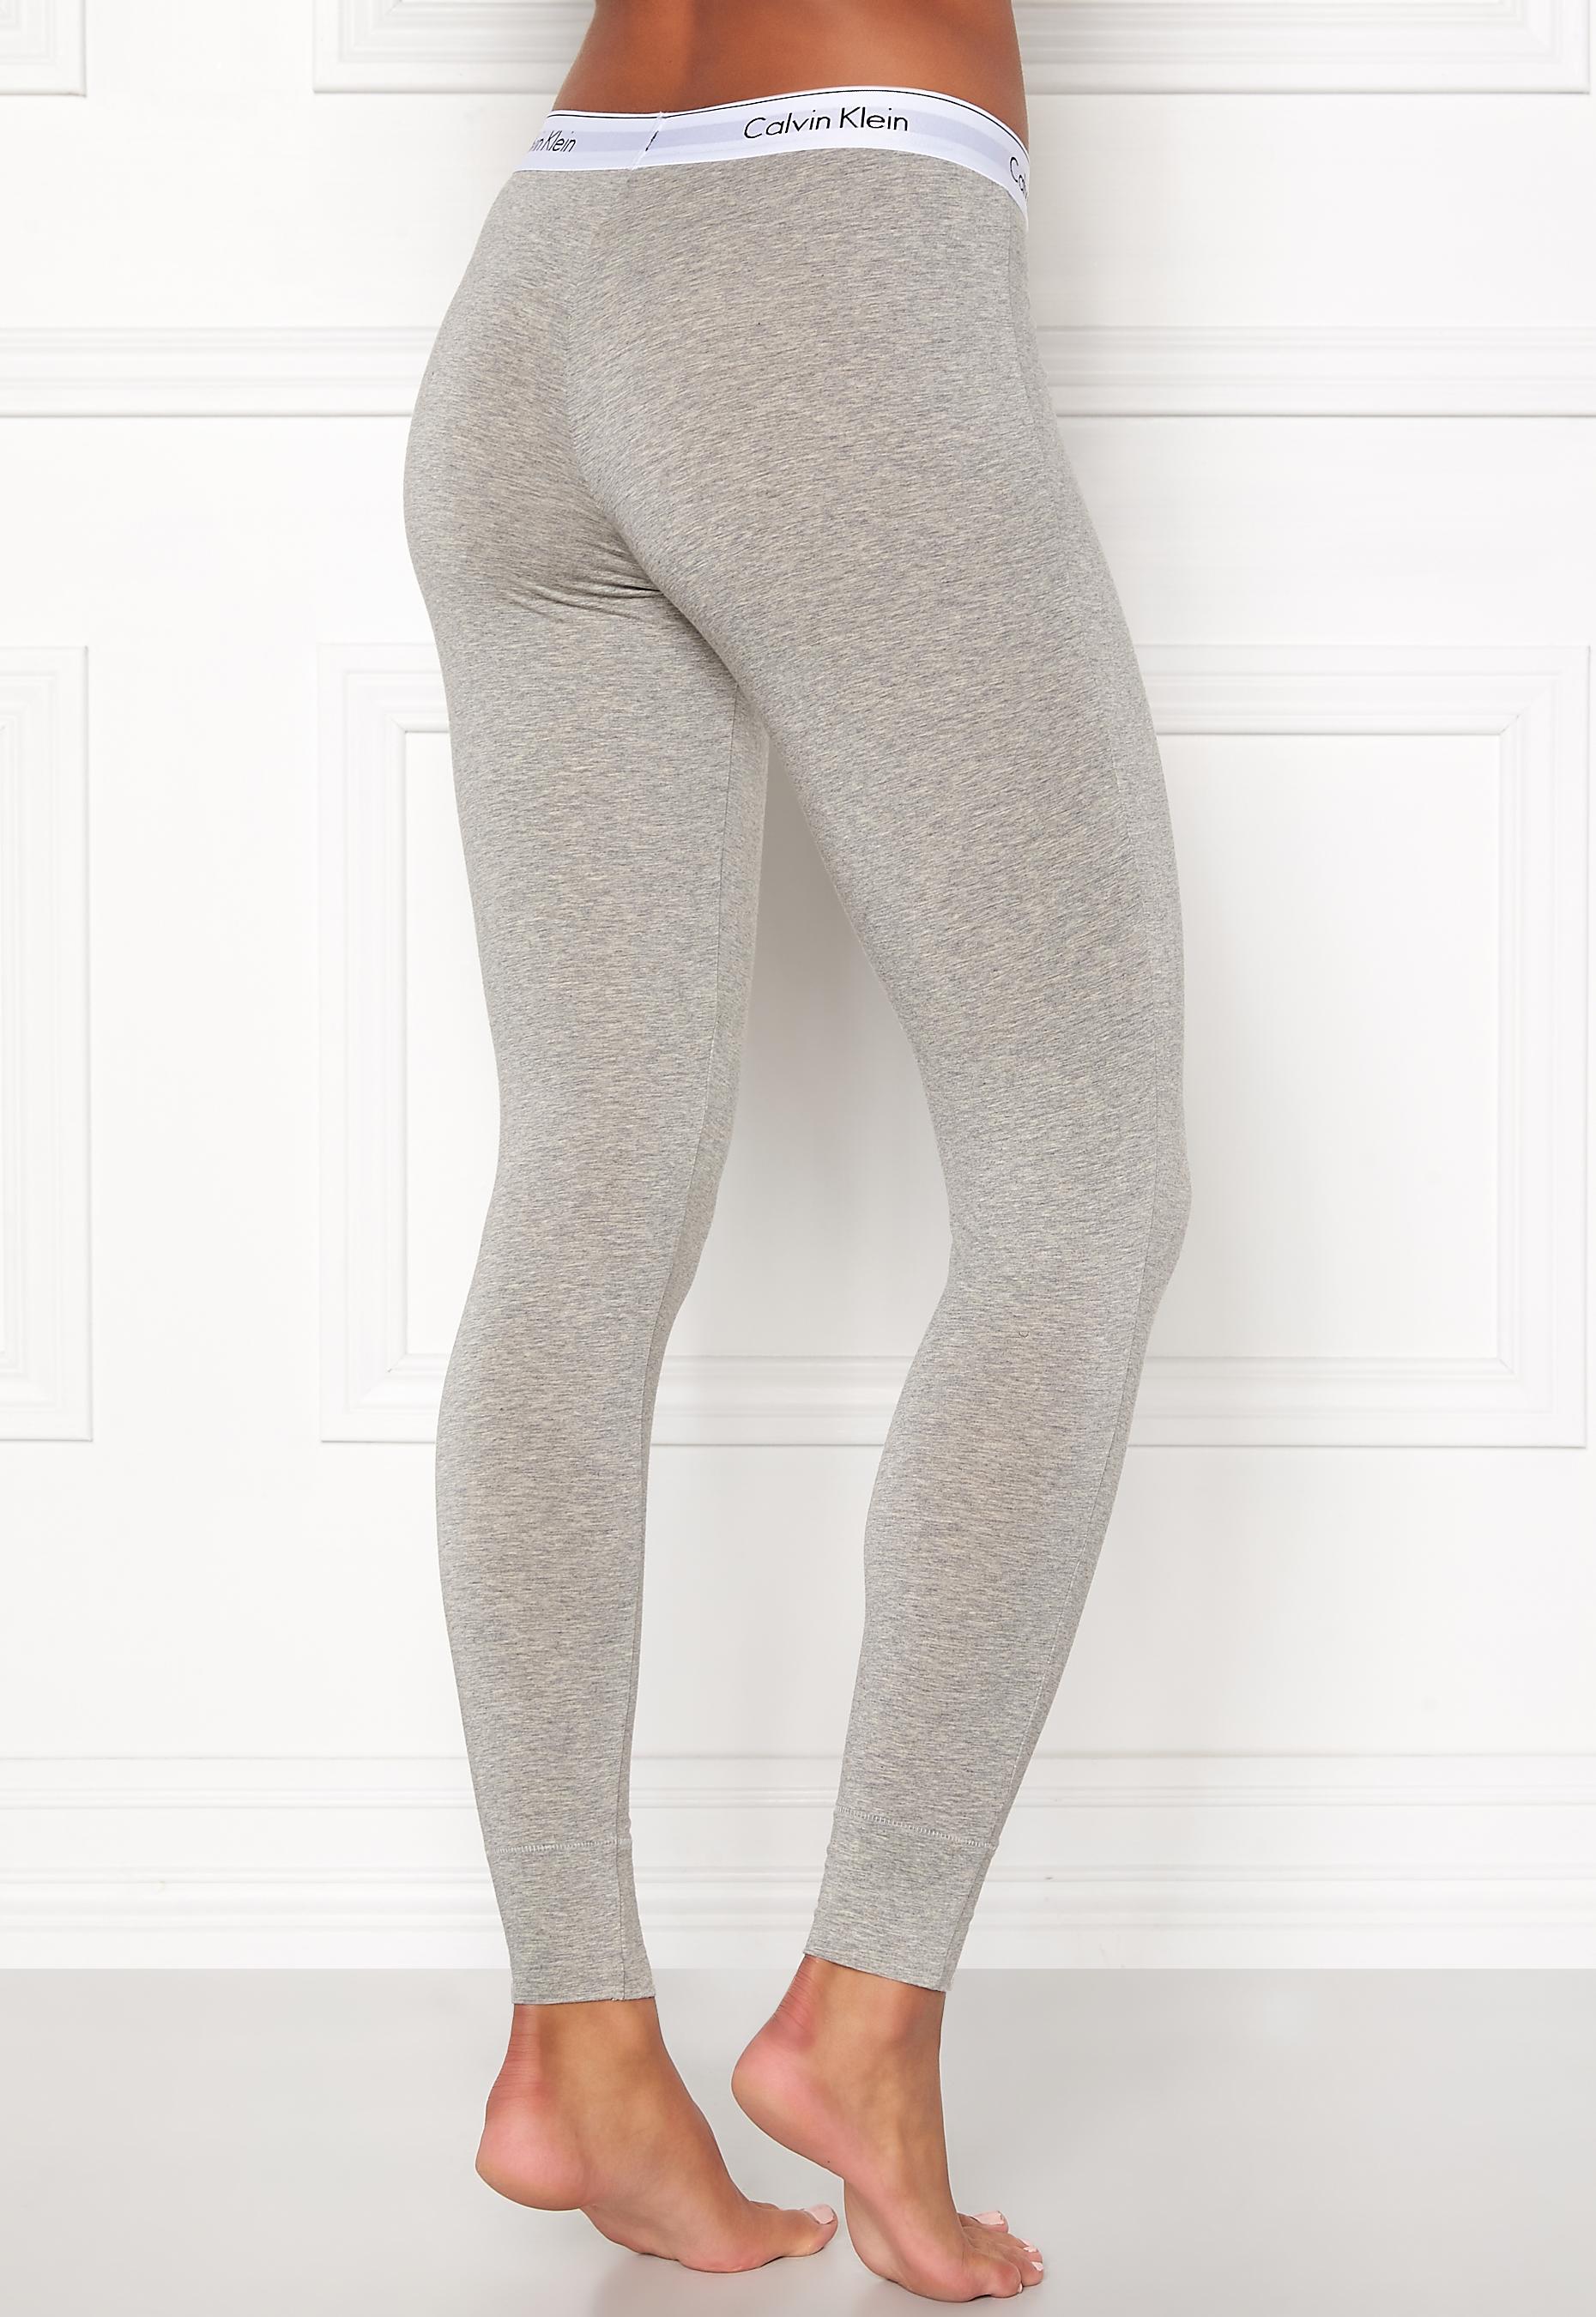 Calvin Klein Legging Pant 0020 Grey Bubbleroom